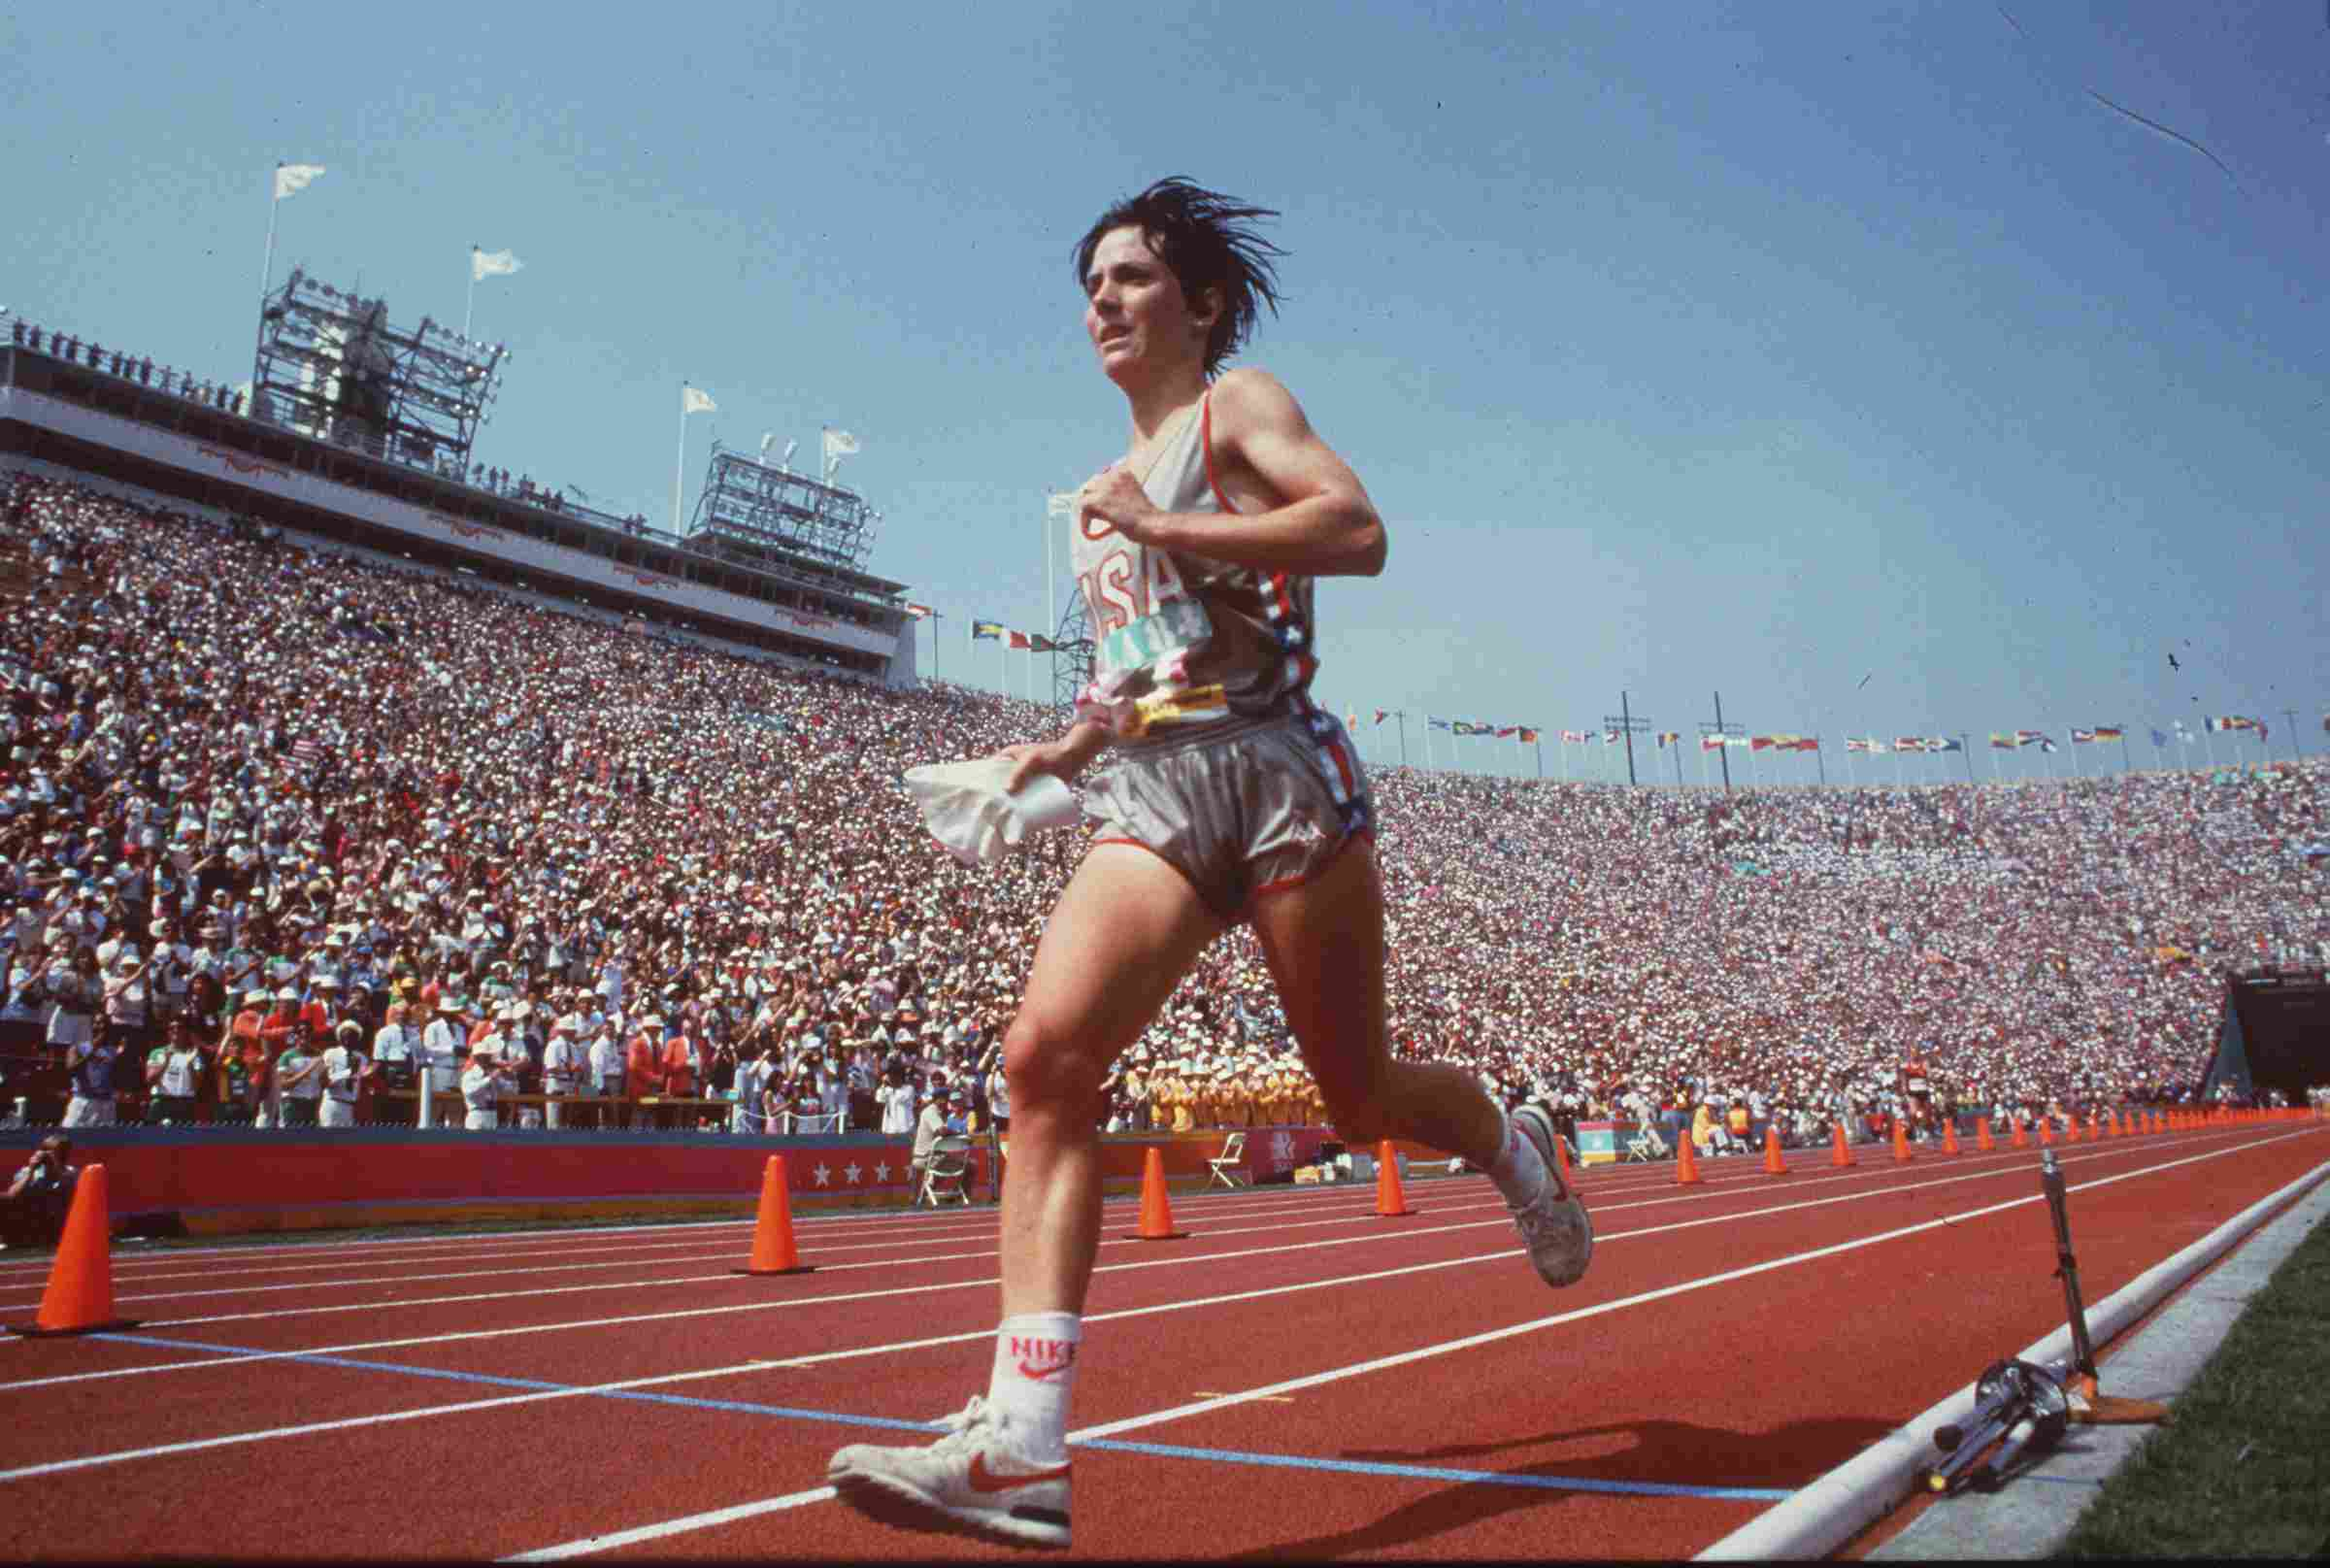 Joan Benoit gana la primera maratón olímpica femenina, celebrada en Los Ángeles en 1984.